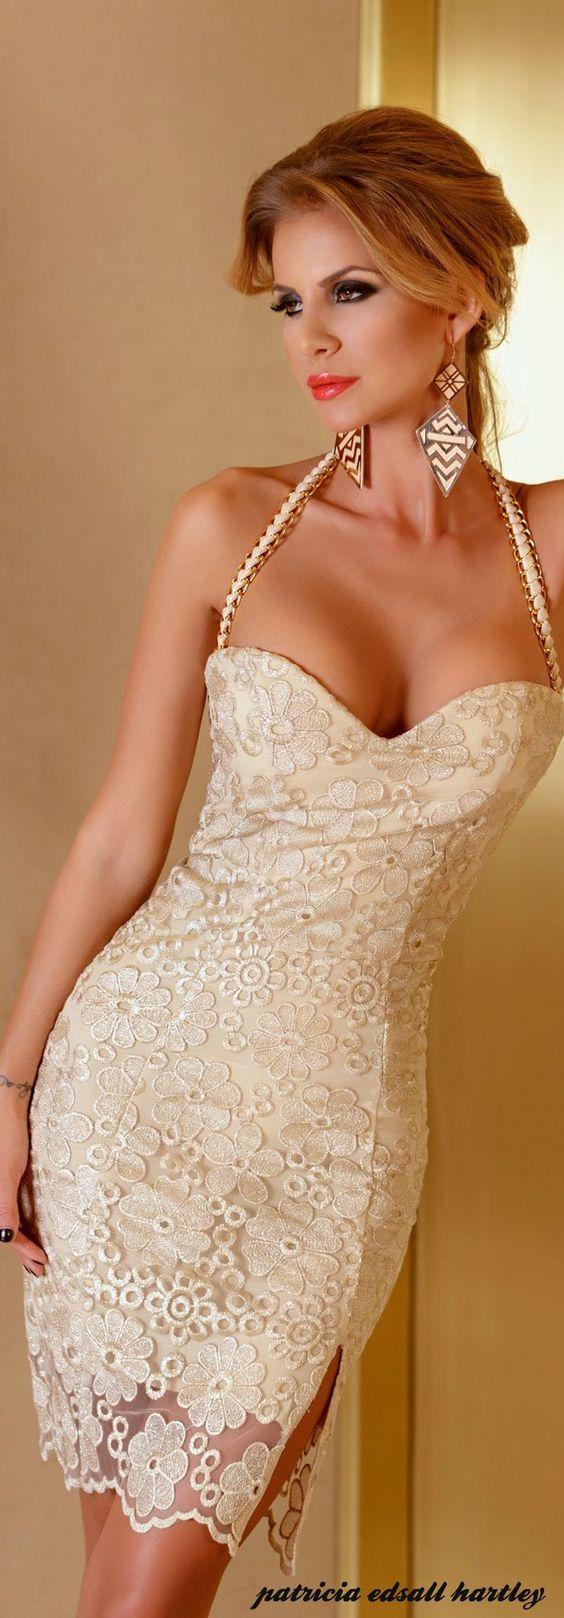 @roressclothes clothing ideas #women fashion cocktail dress